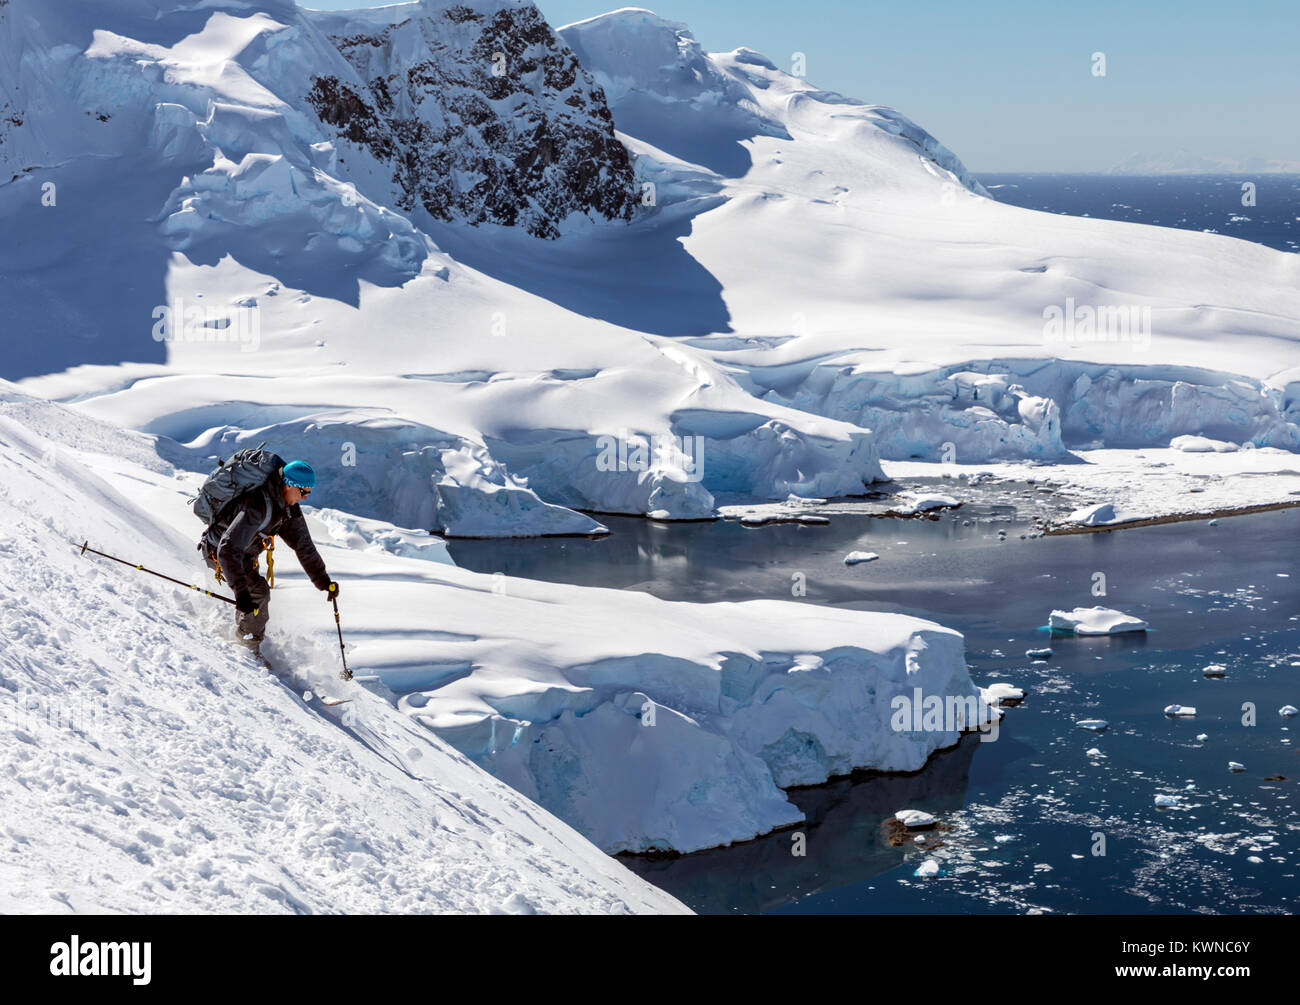 Alpine ski mountaineer skiing downhill in Antarctica; Nansen Island Stock Photo